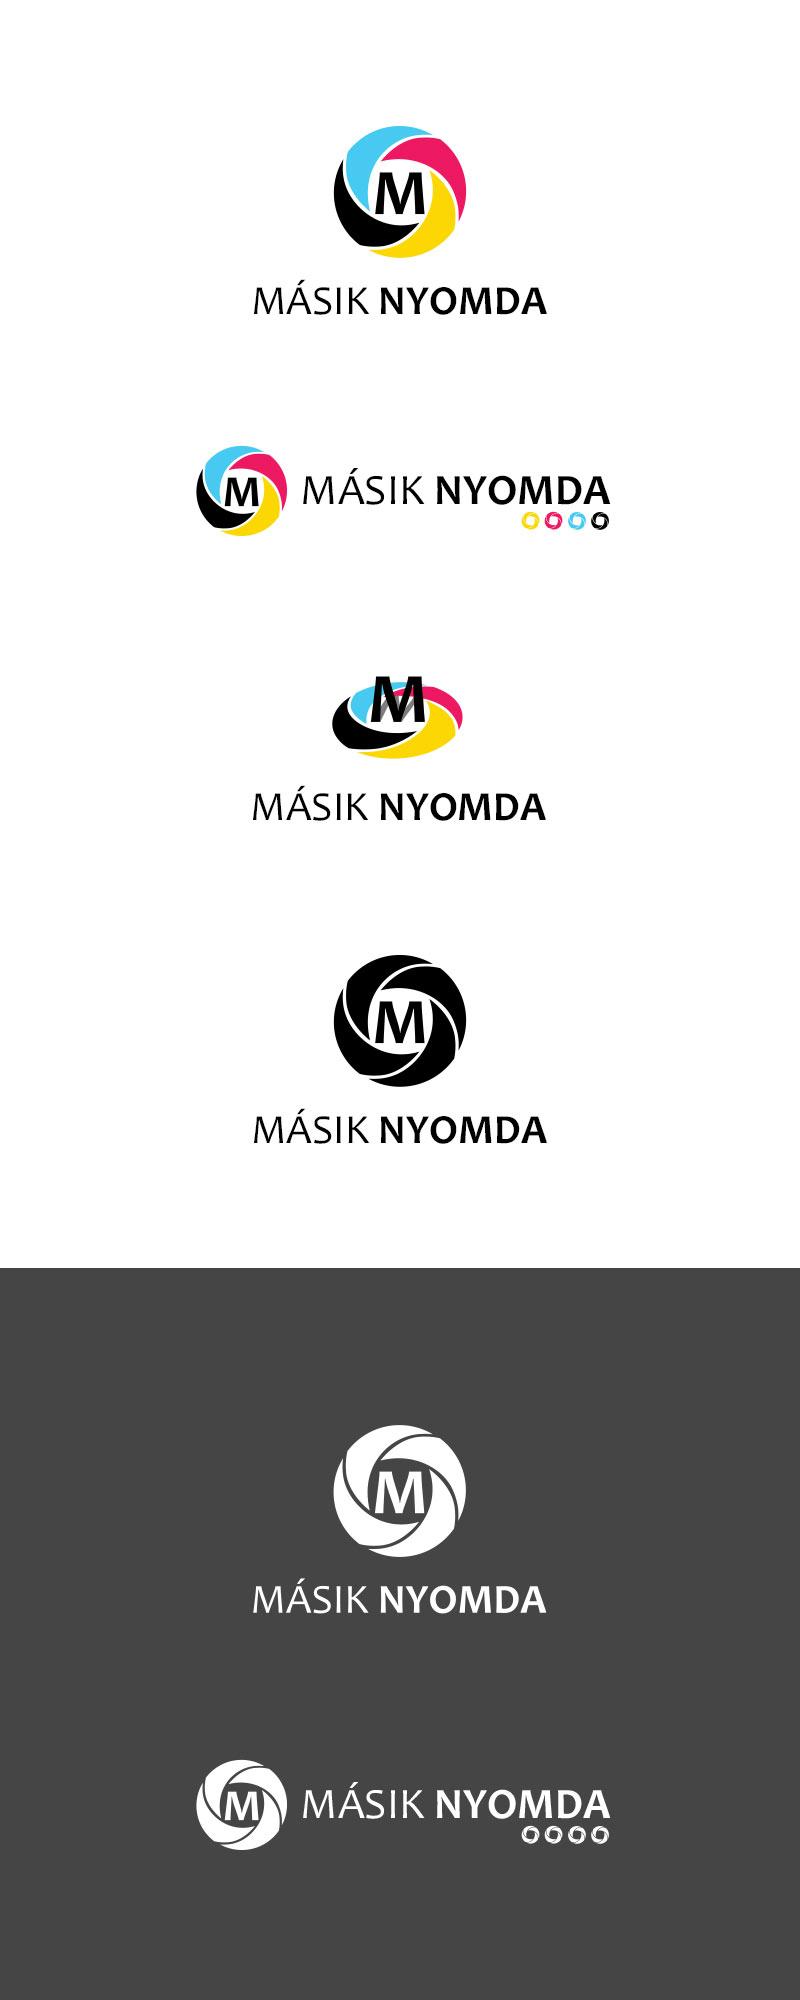 stargeckos_masik_nyomda_logo_tervezes_vegleges